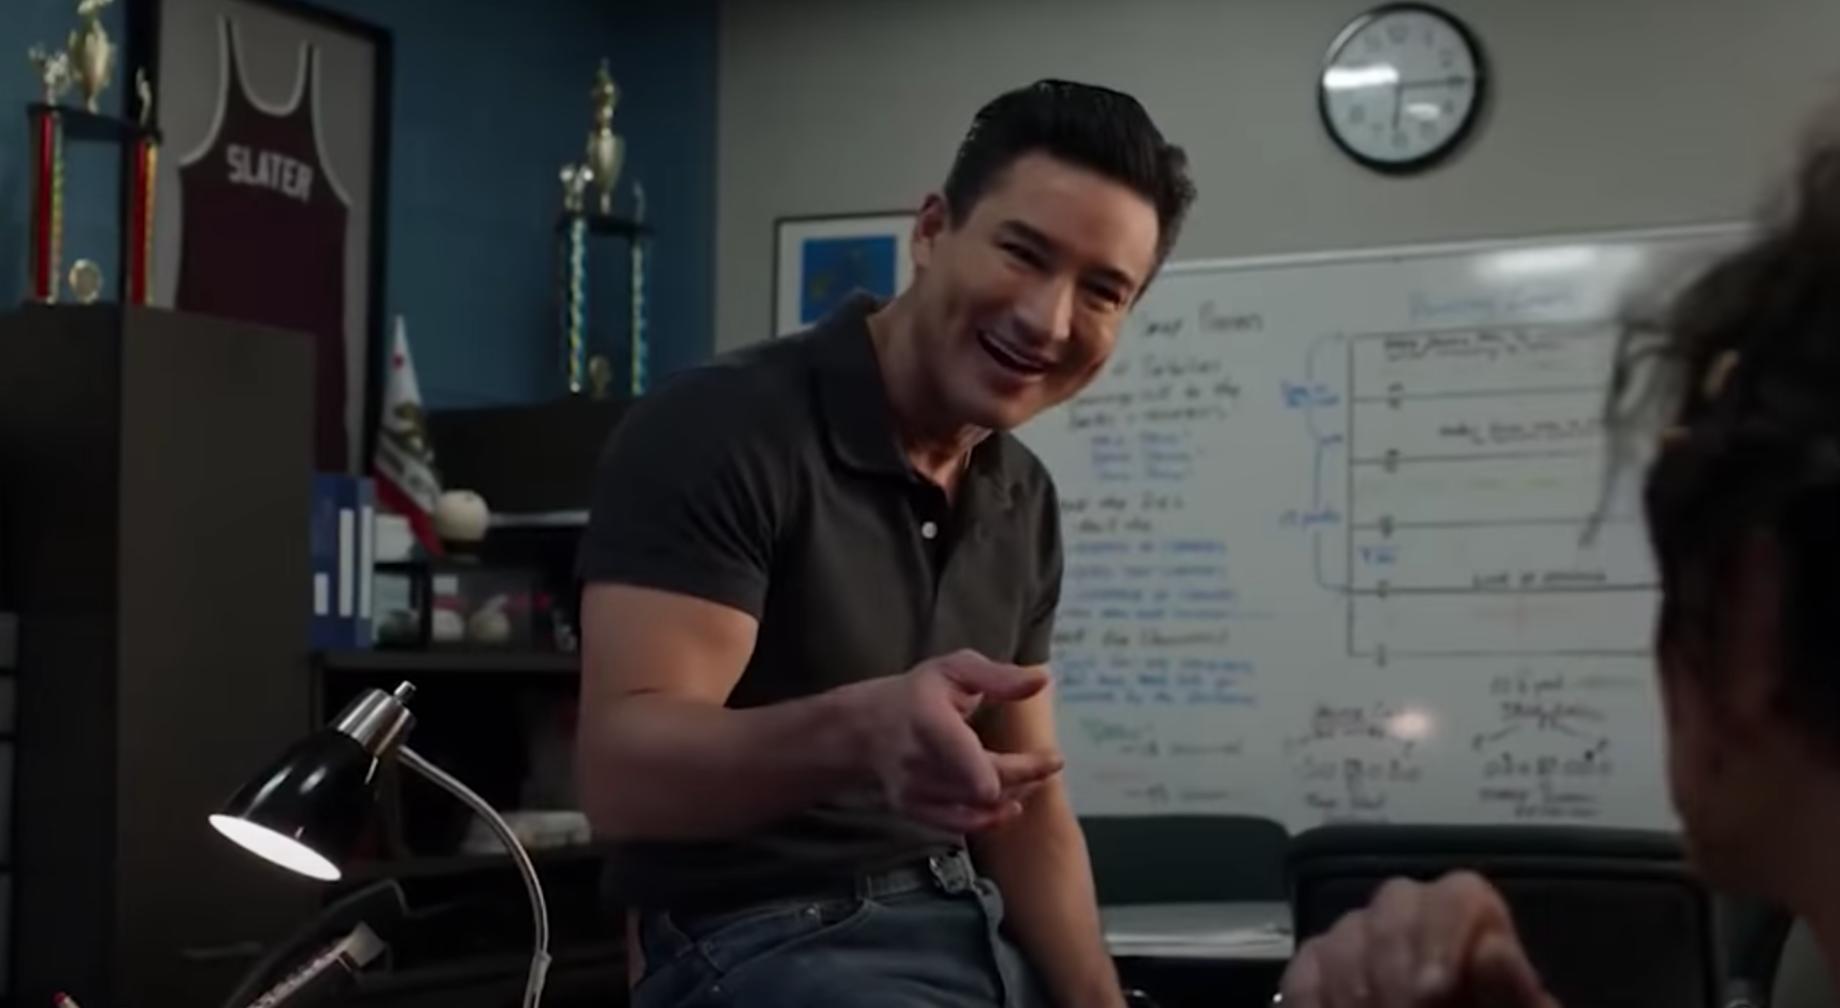 Mario Lopez and Elizabeth Berkley Star in 'Saved by the Bell' Sequel Series Teaser Trailer